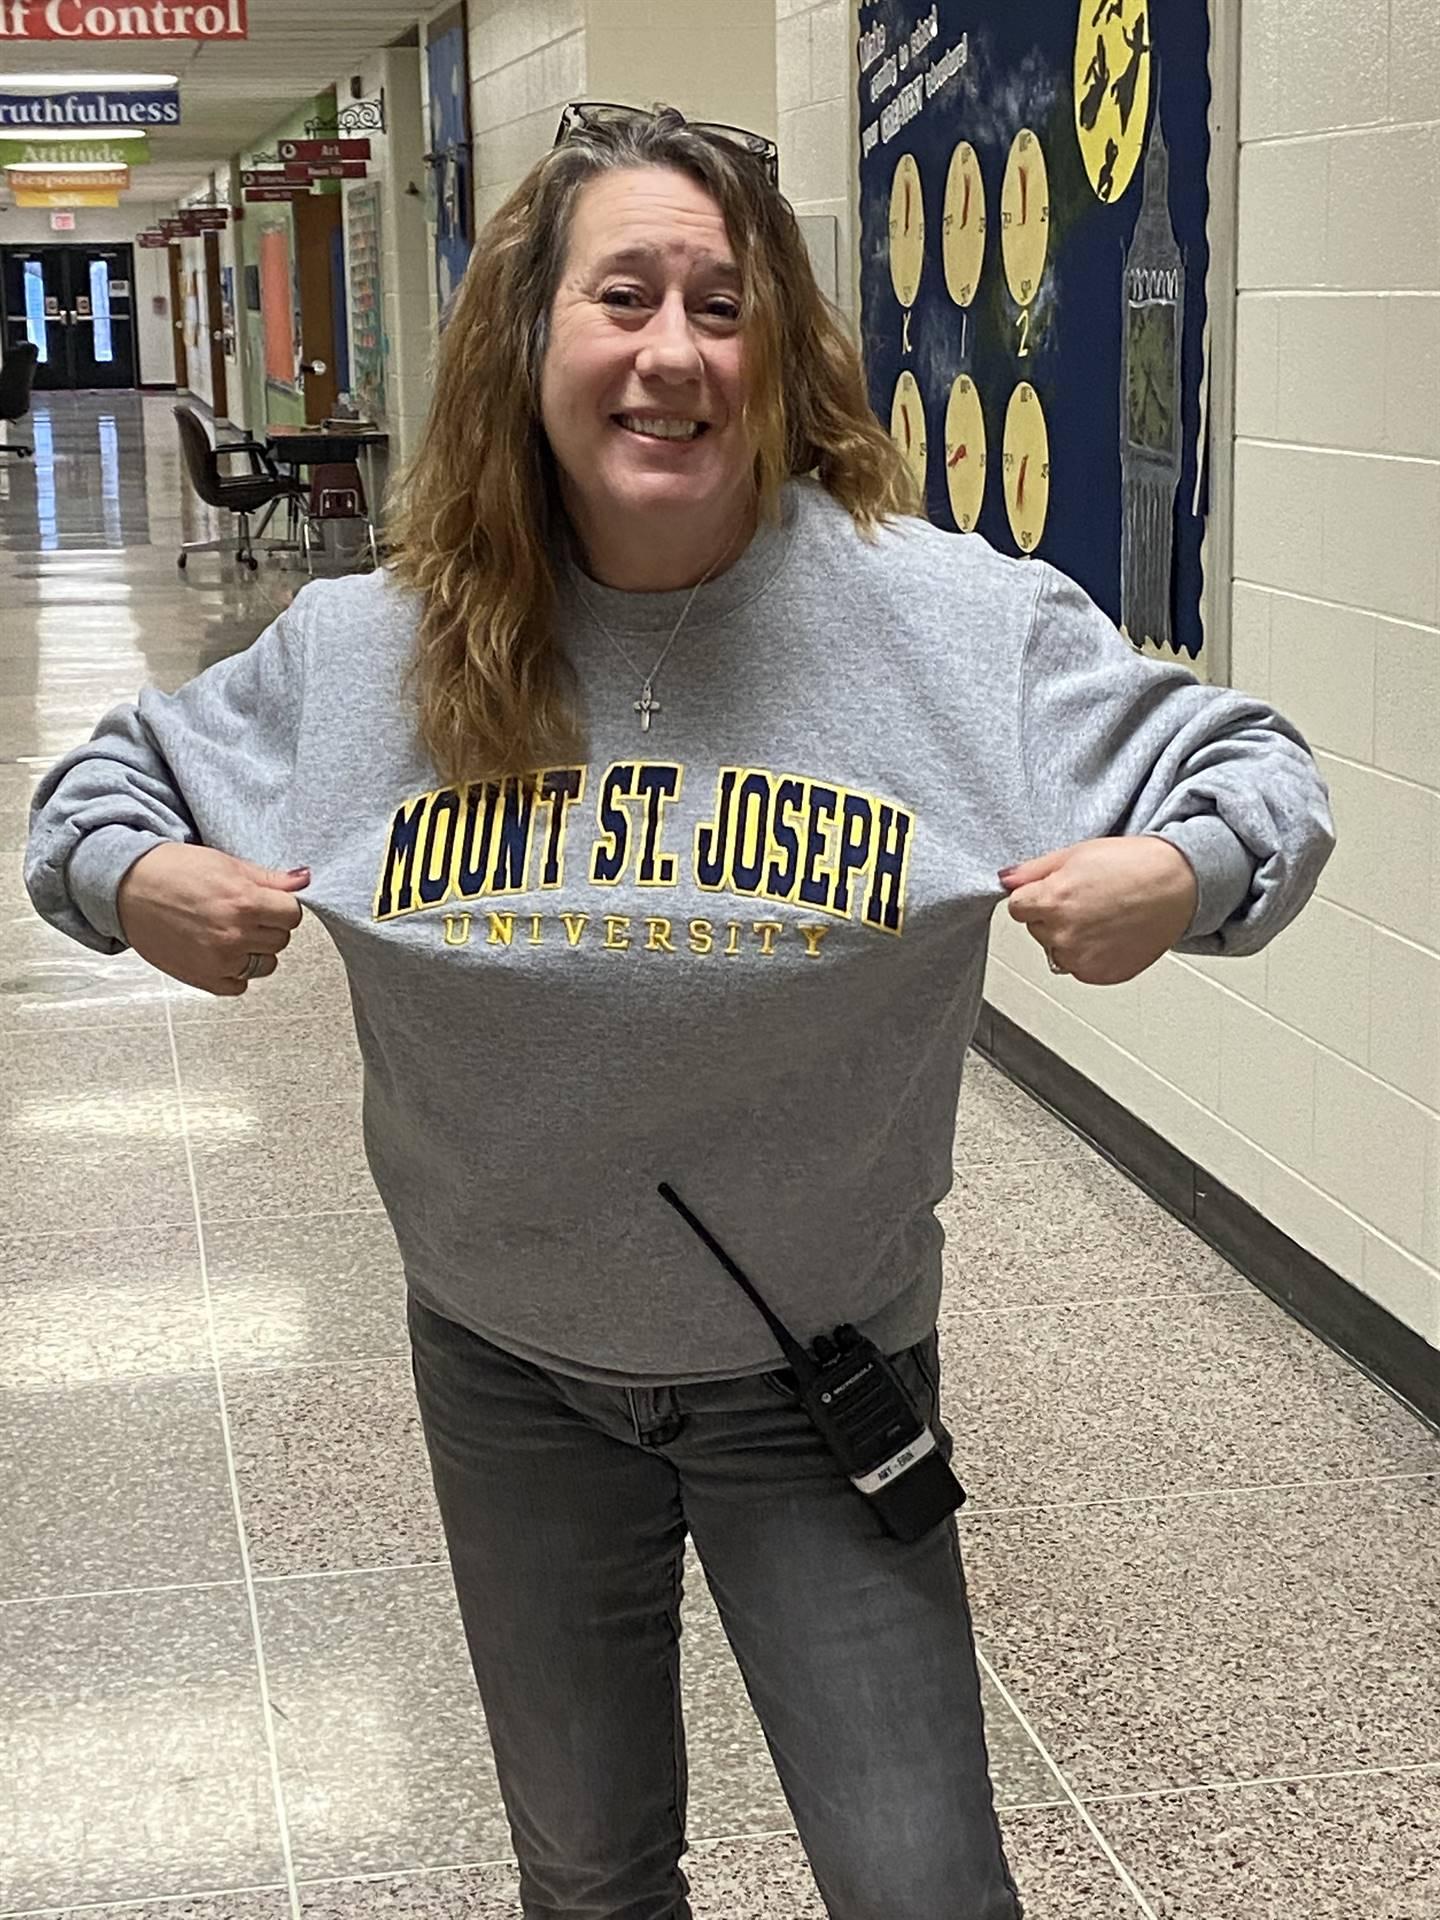 A teacher representing her university